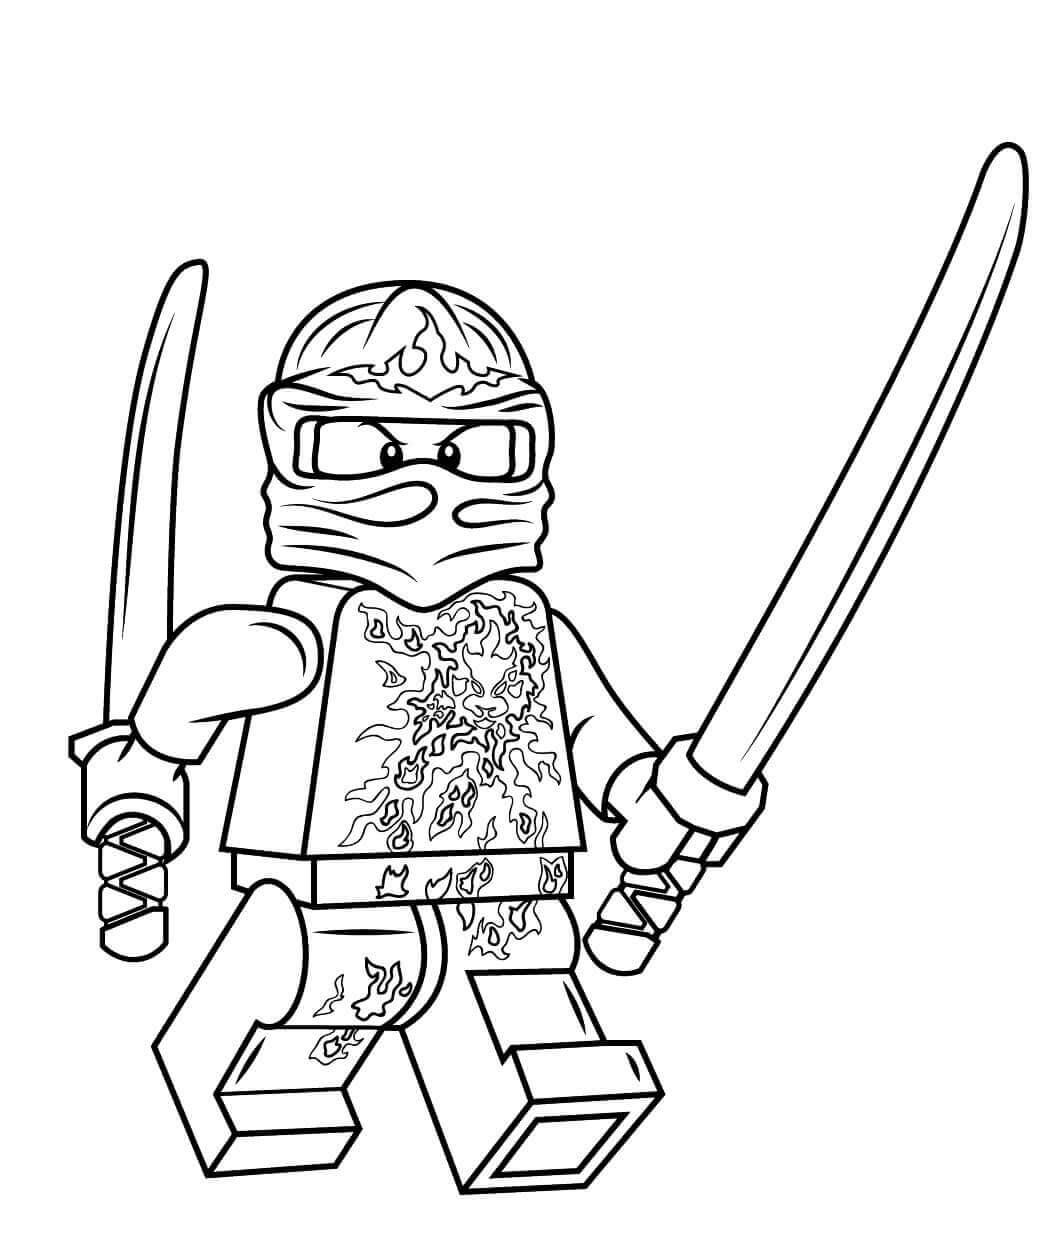 30 free printable lego ninjago coloring pages, ninjago coloring pages